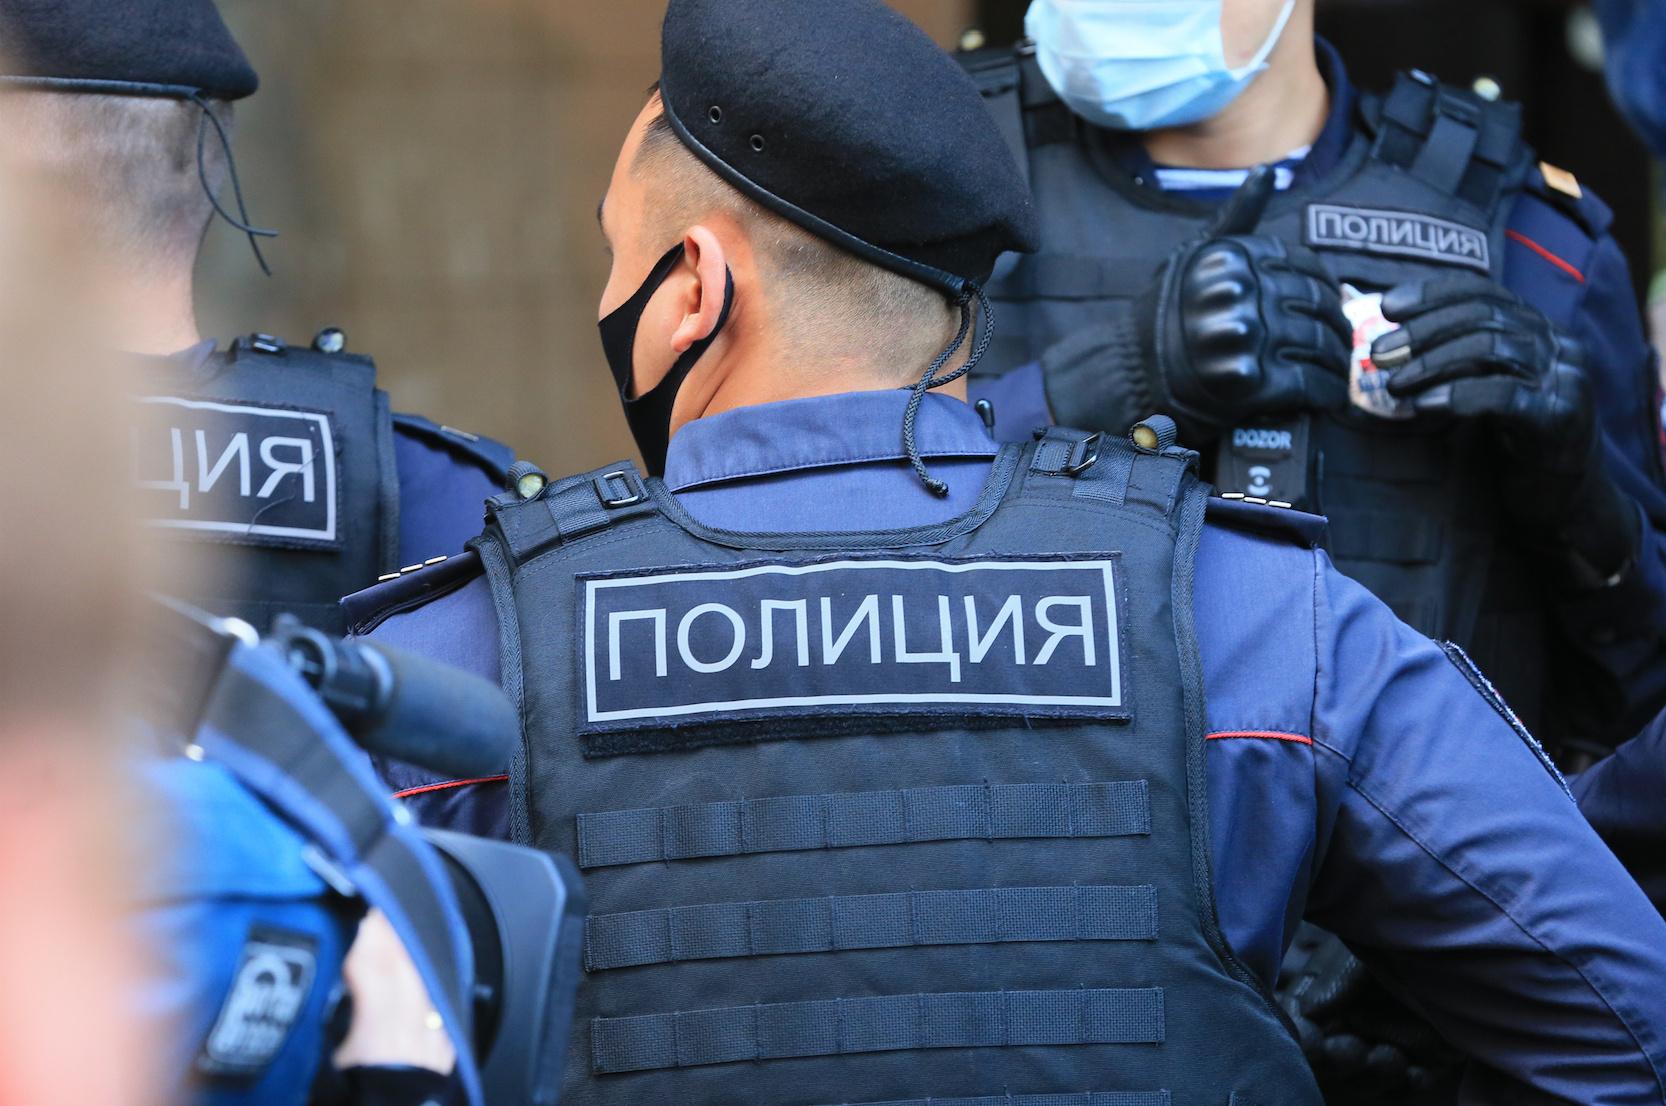 В Татарстане подросток напал на полицейских с ножом и коктейлем Молотова. Его застрелили